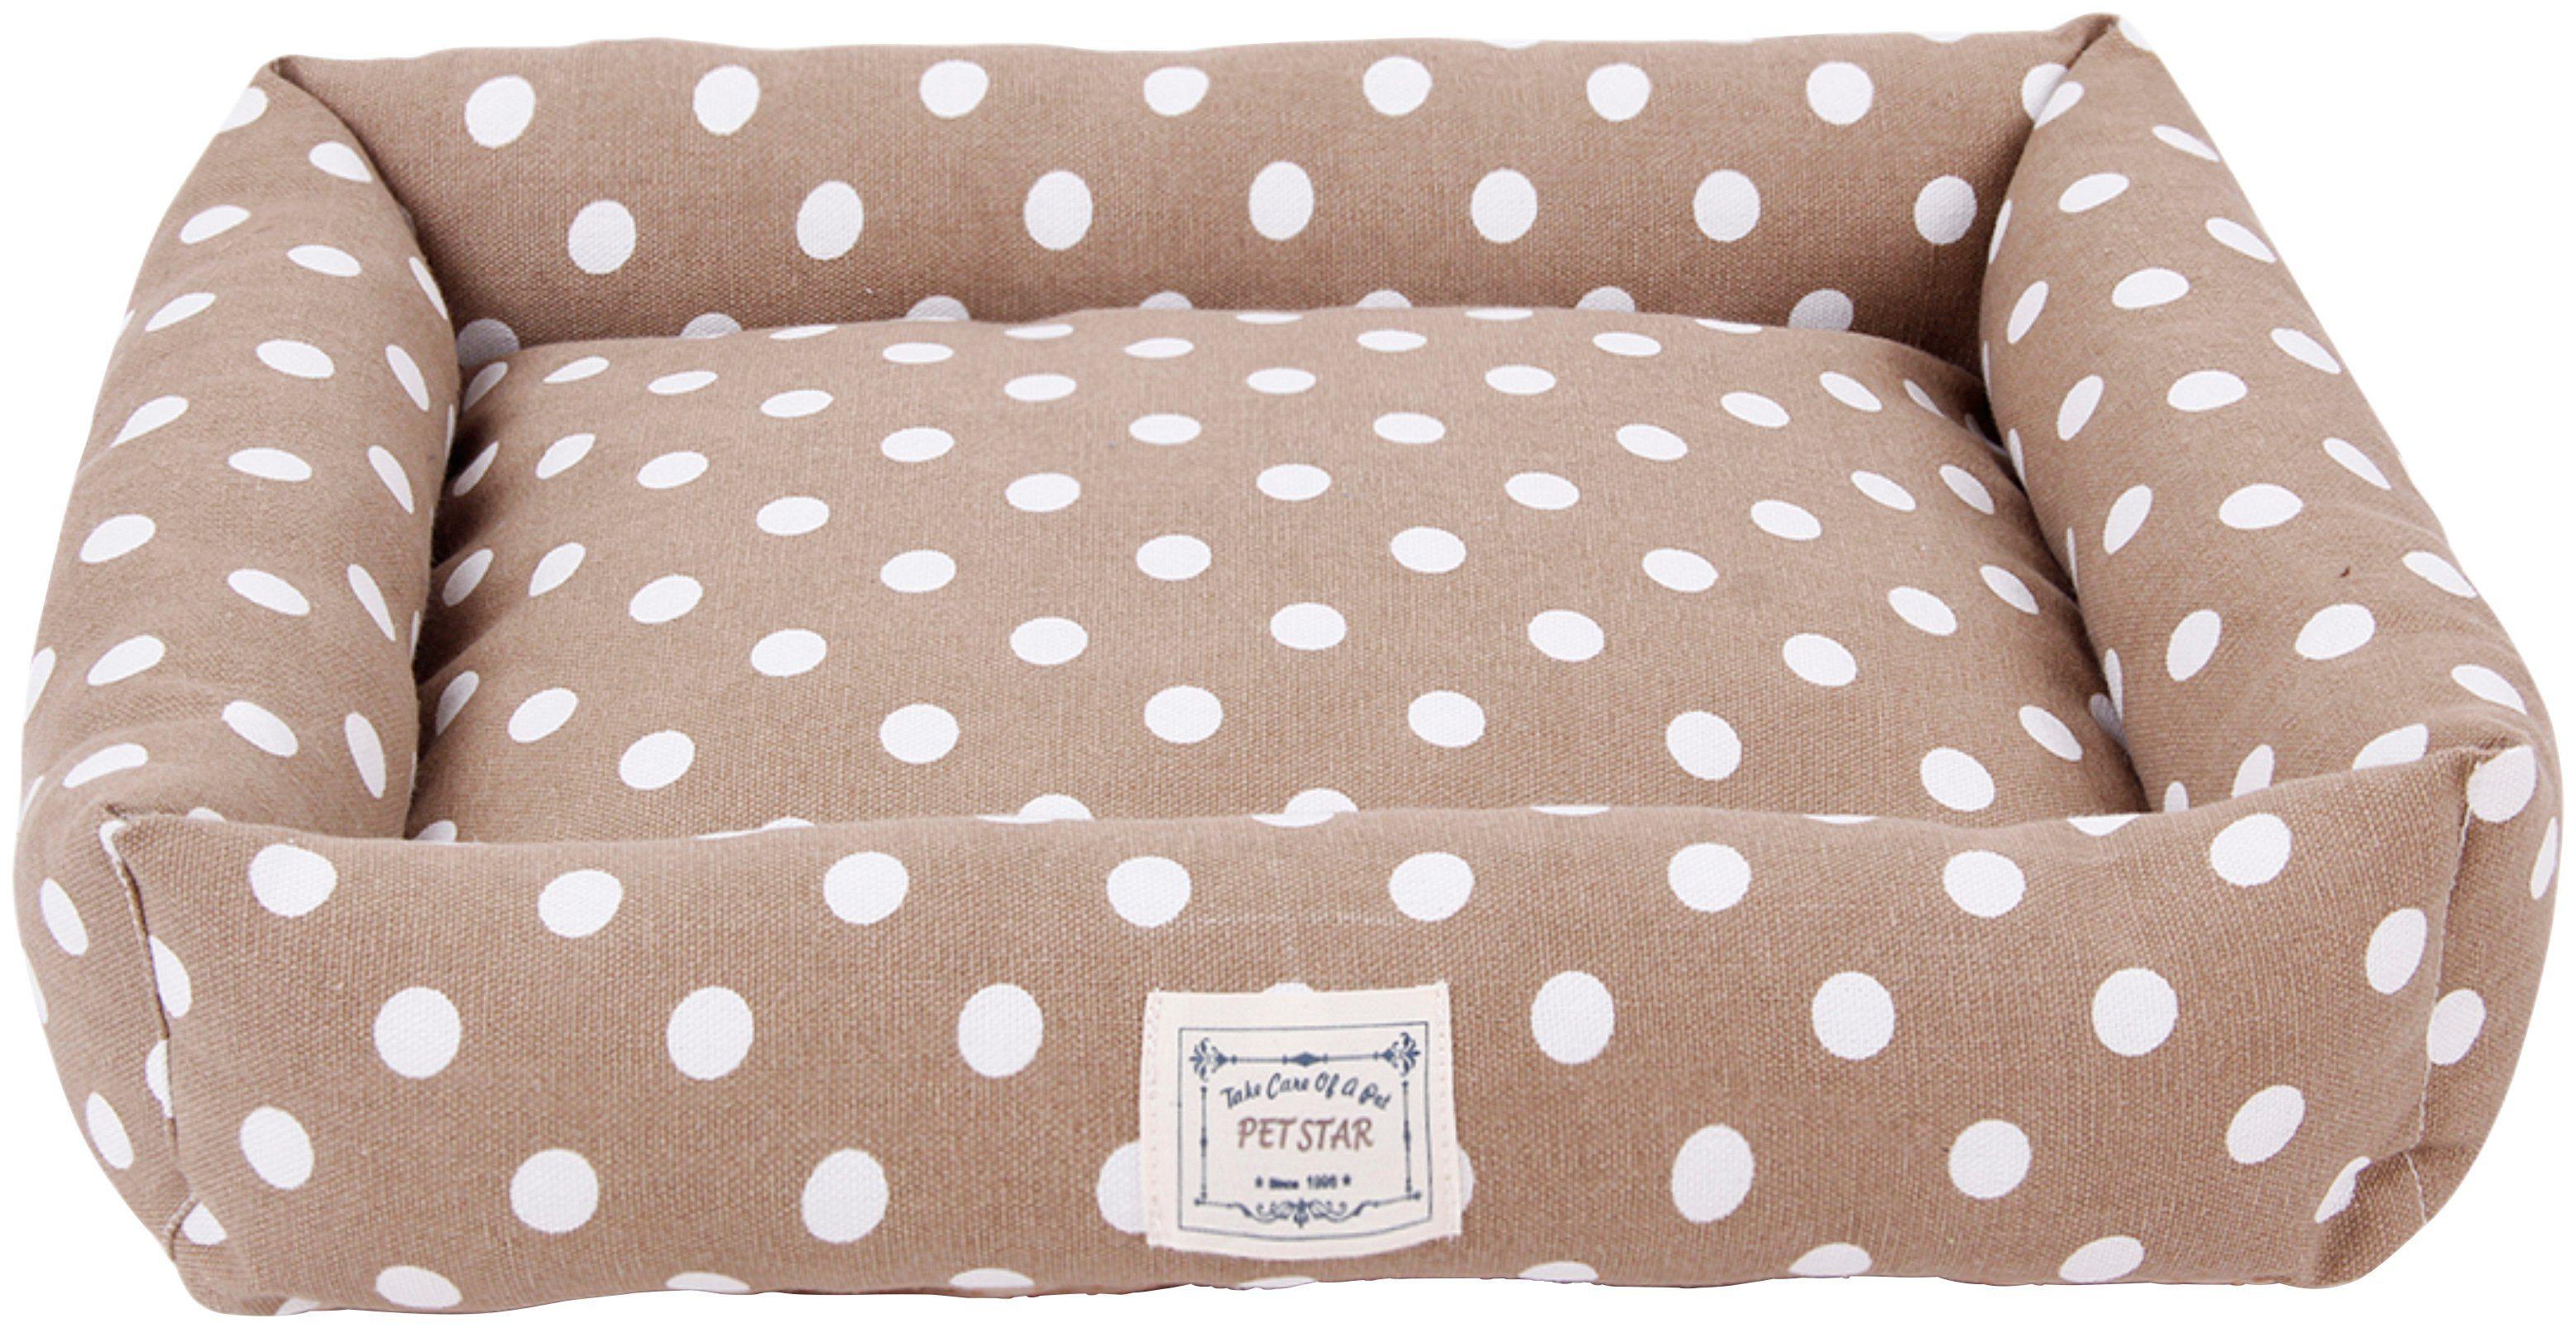 HEIM Hundebett und Katzenbett »Dots«, Pastellfarben, BxT: 42x48 cm